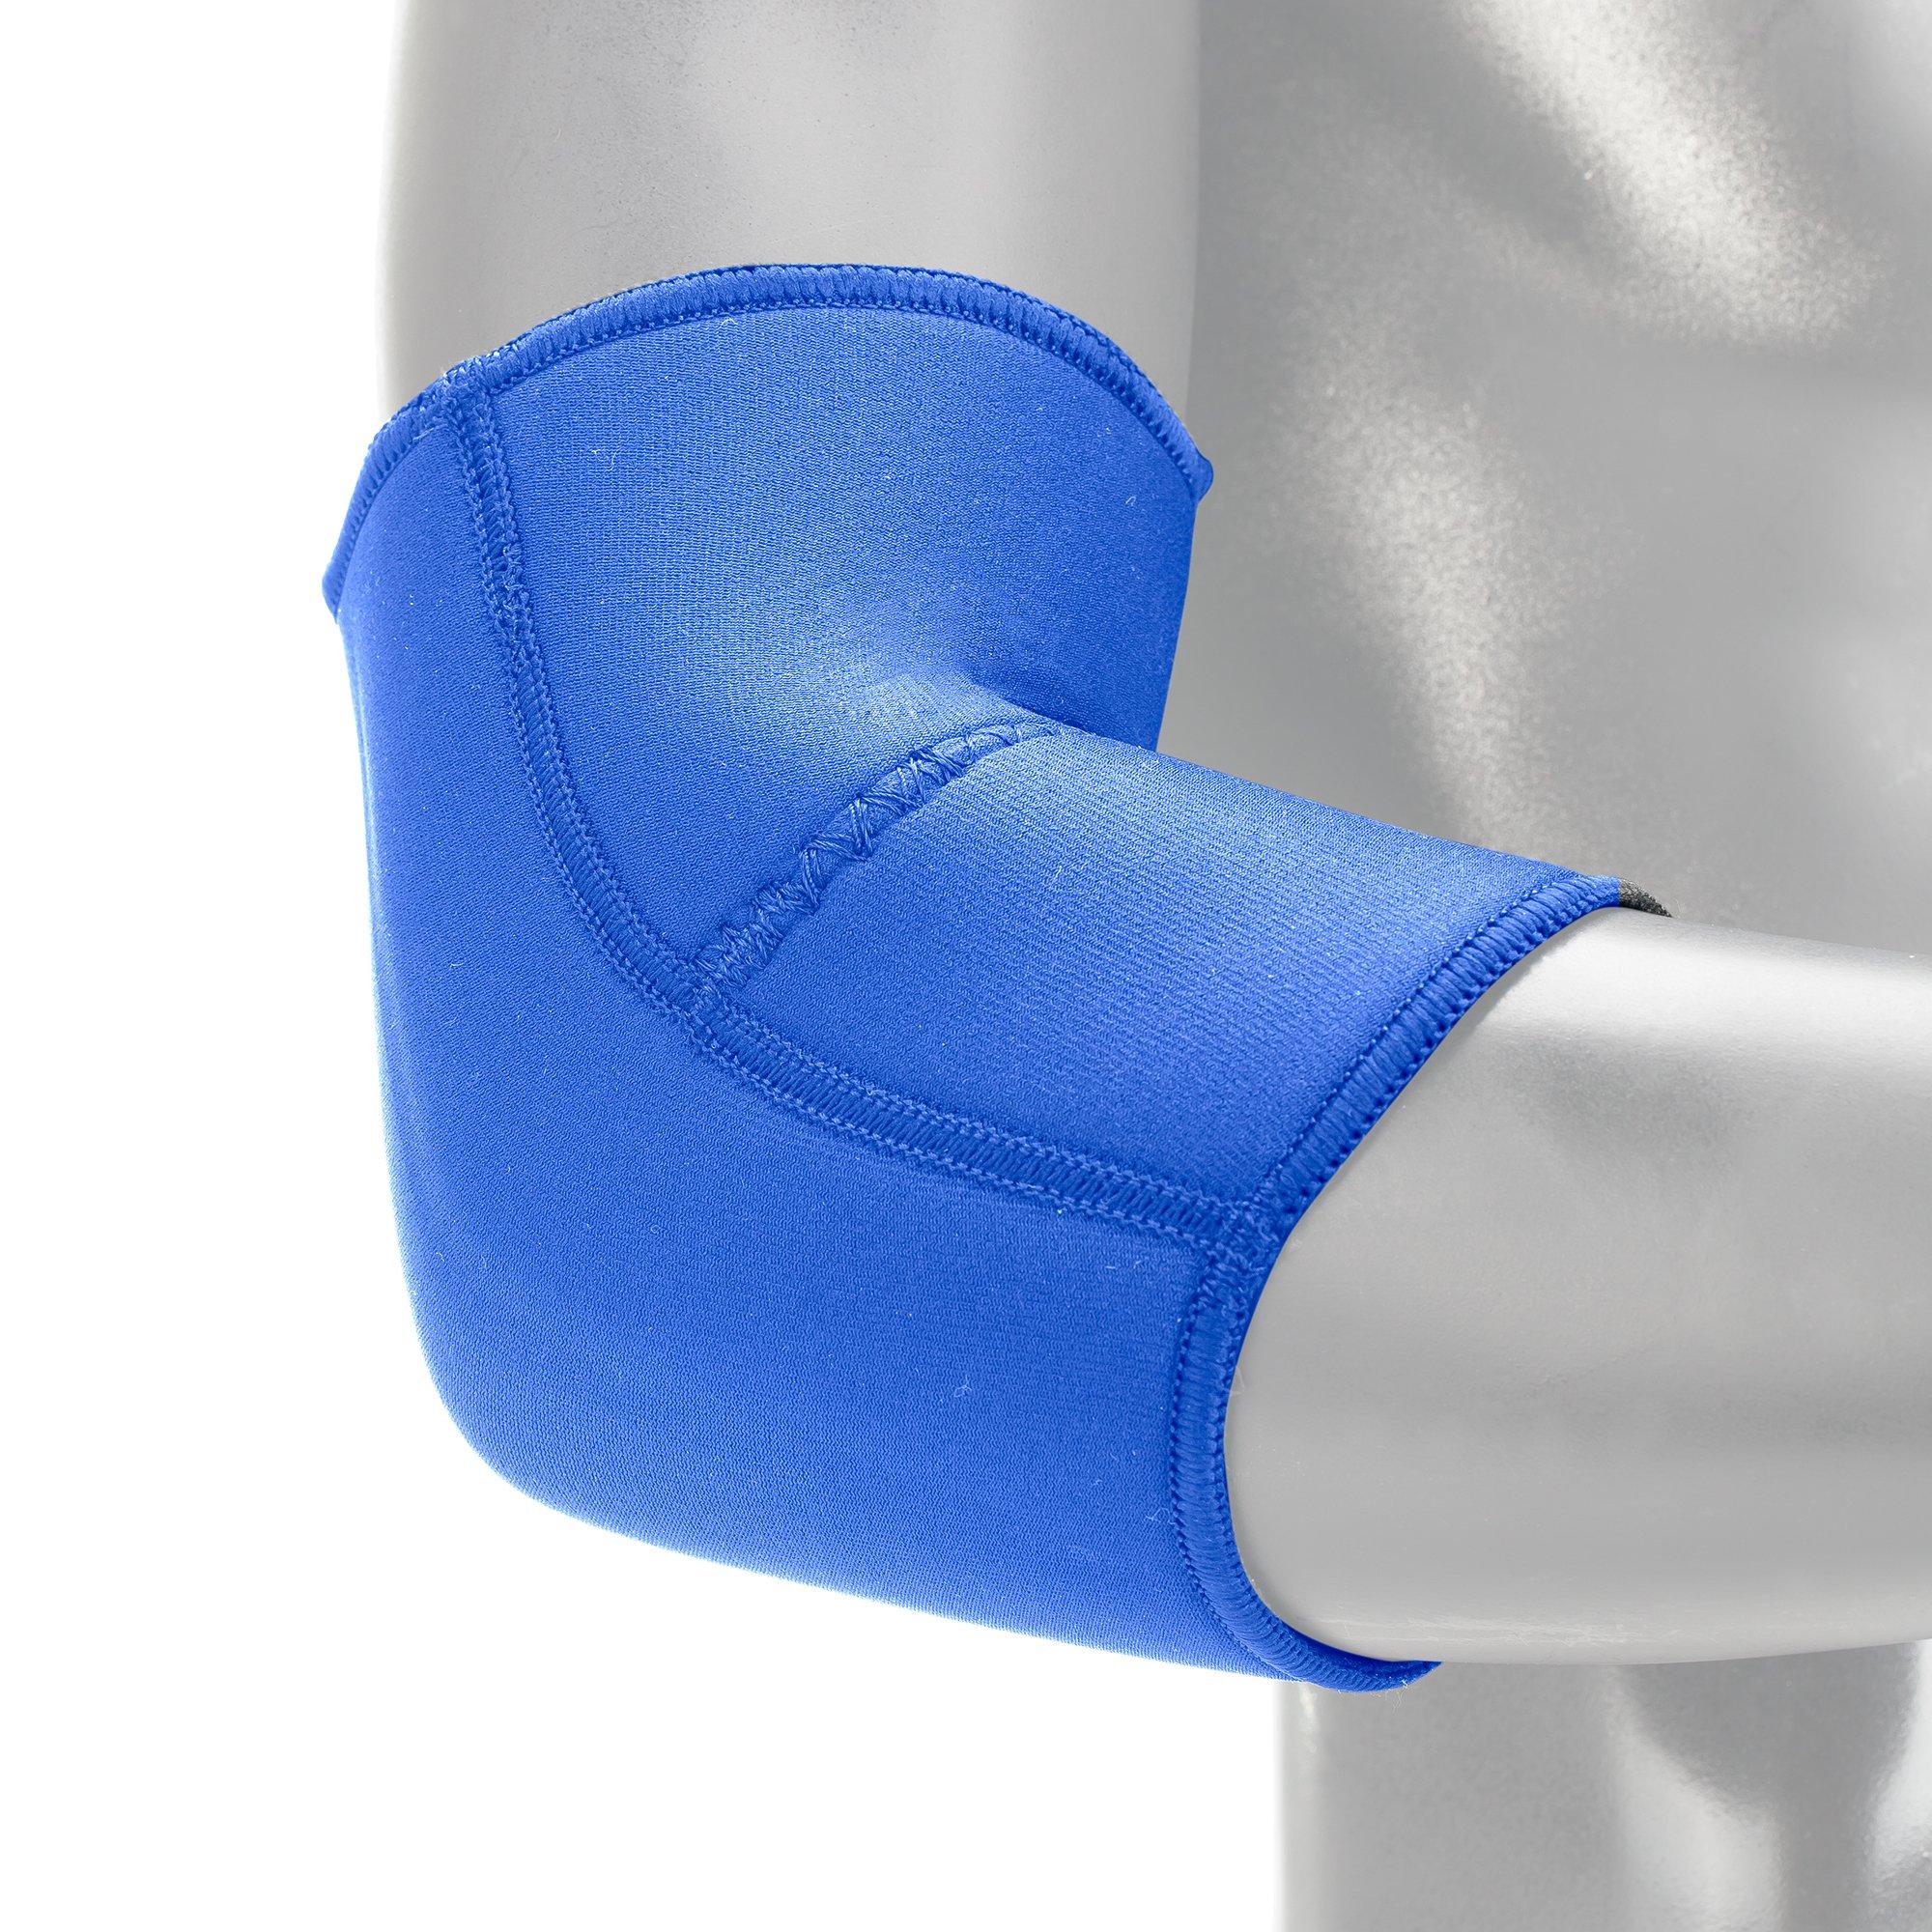 EVS Sports Unisex-Adult Neoprene Elbow Support (Blue, Medium)